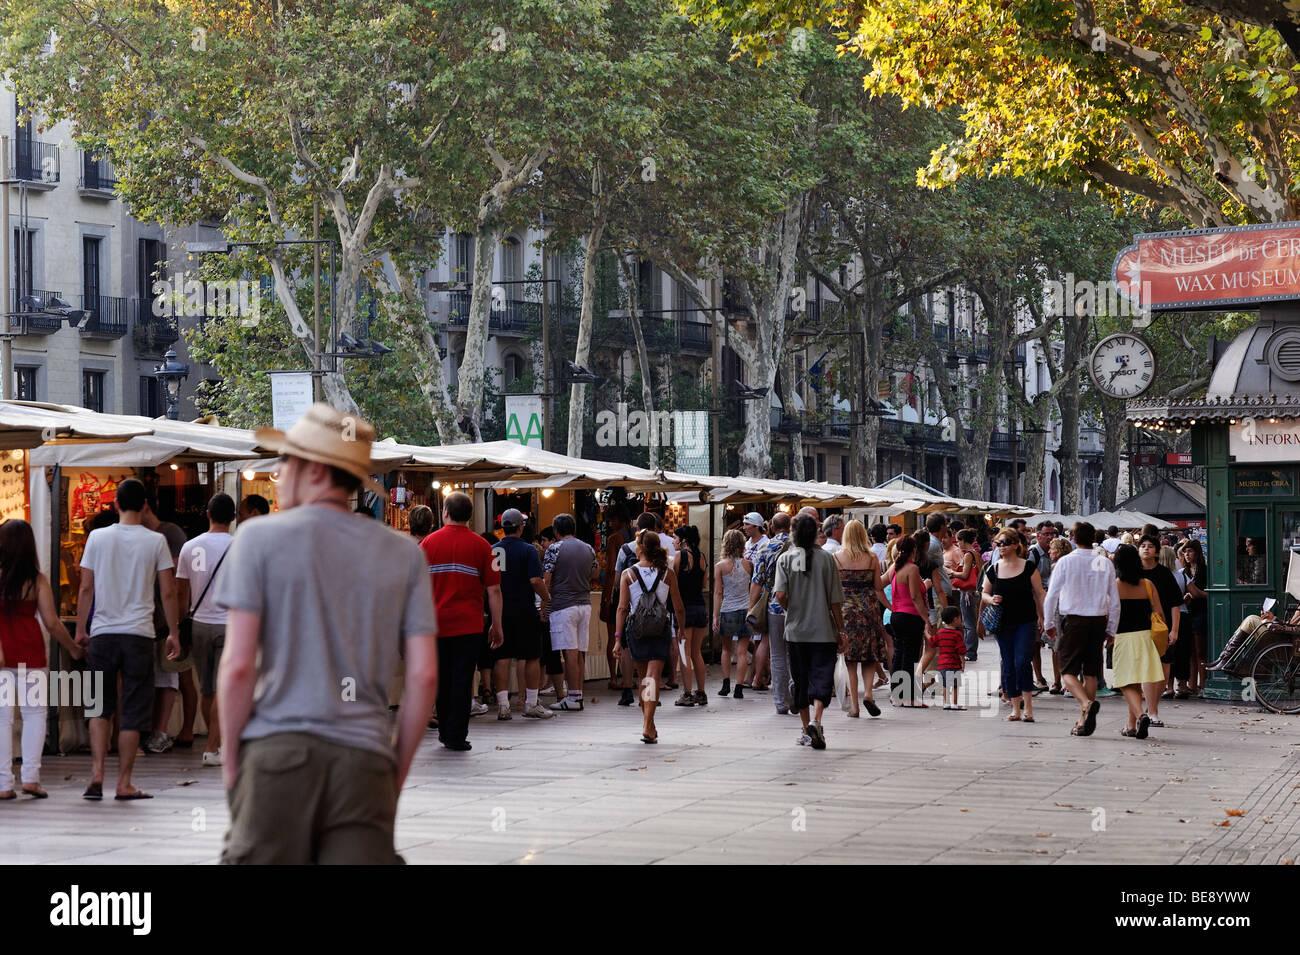 Artisan crafts market on Las Ramblas. Barcelona. Spain - Stock Image